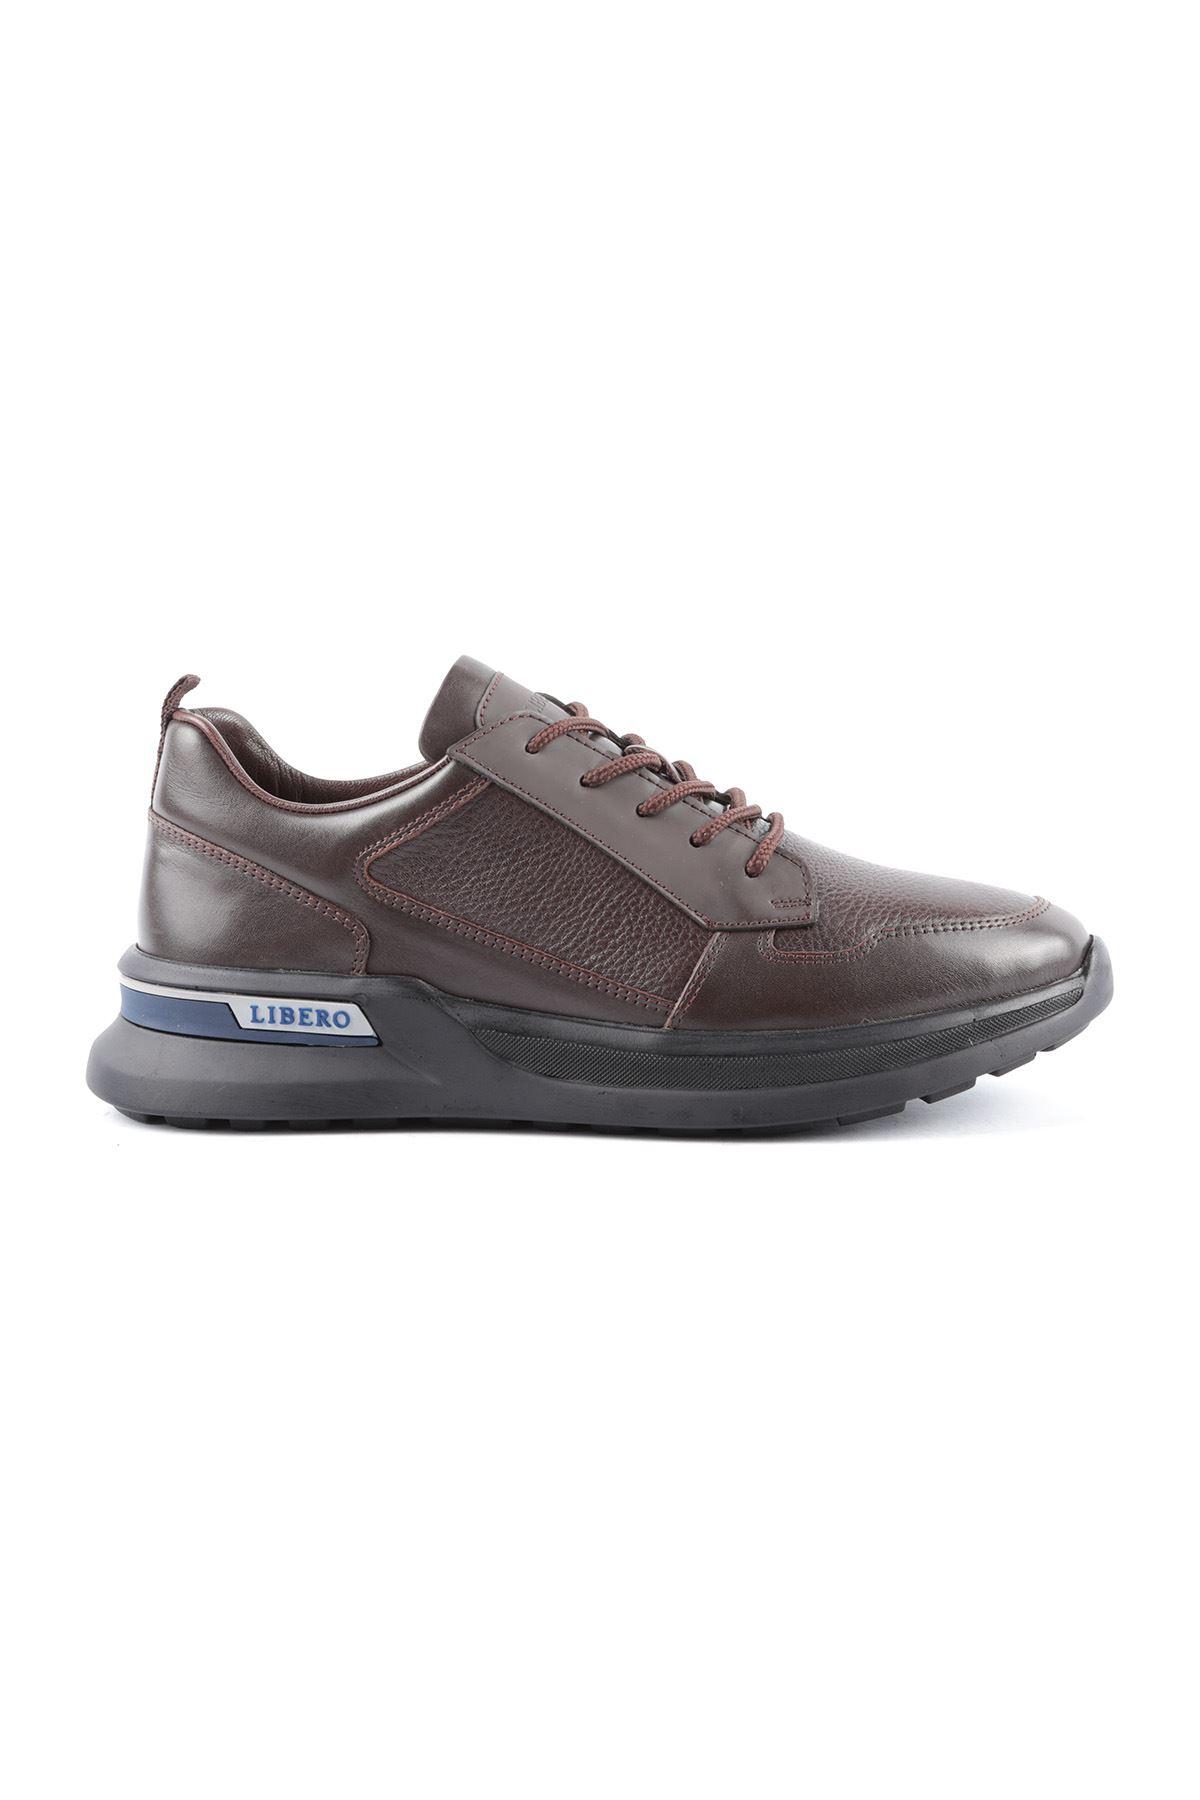 Libero L3141 EA Kahverengi Spor Ayakkabı